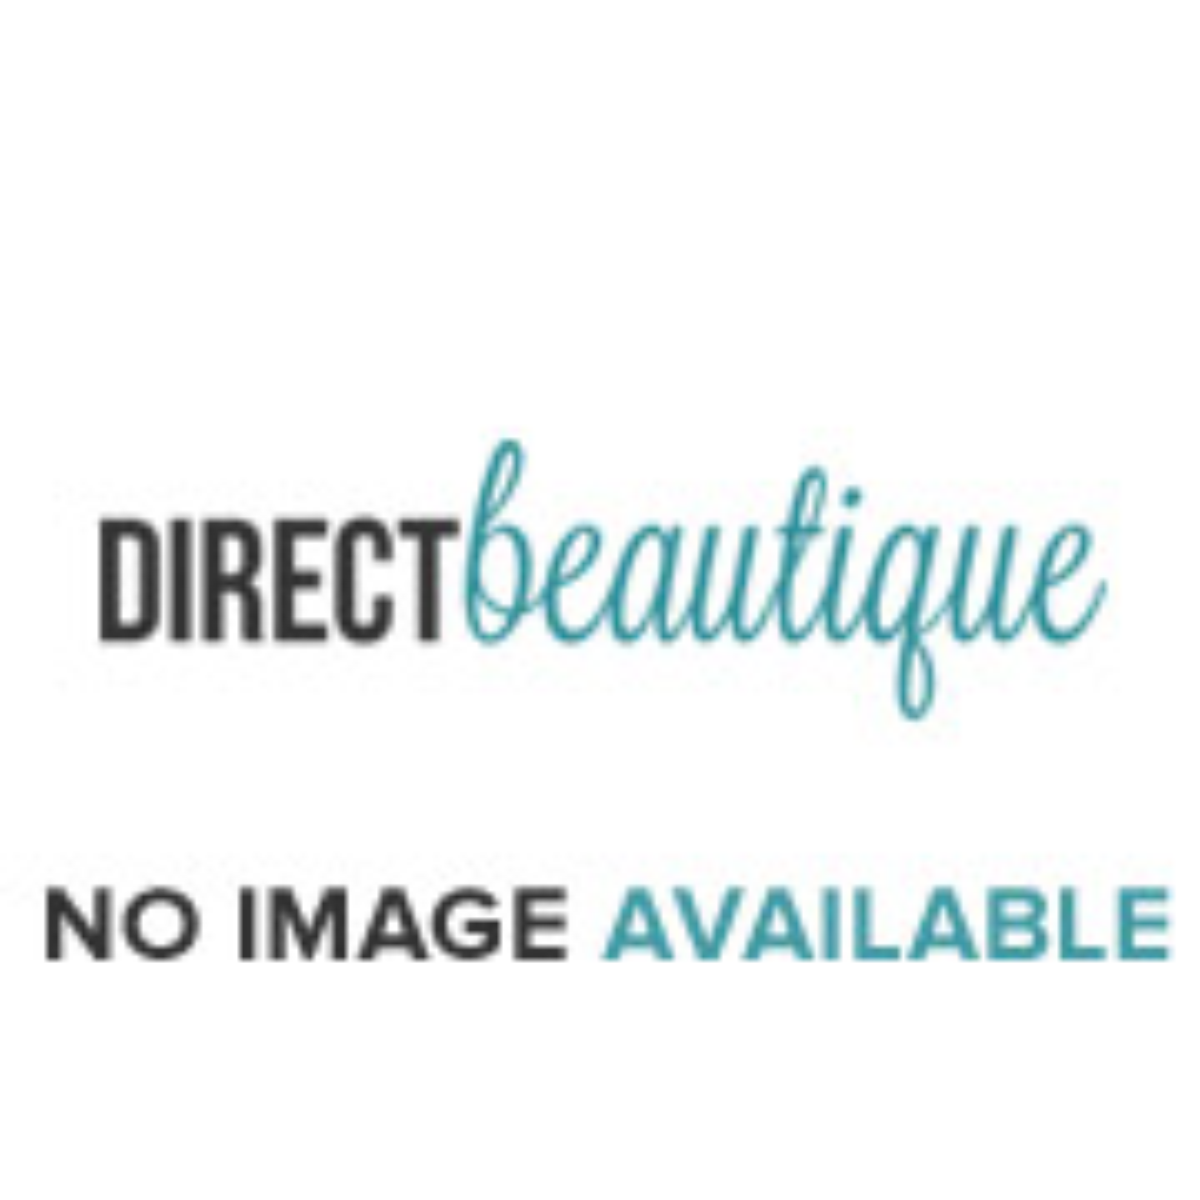 Kerastase Discipline Bain Fluidealiste Shampoo No Sulfates 1000ml